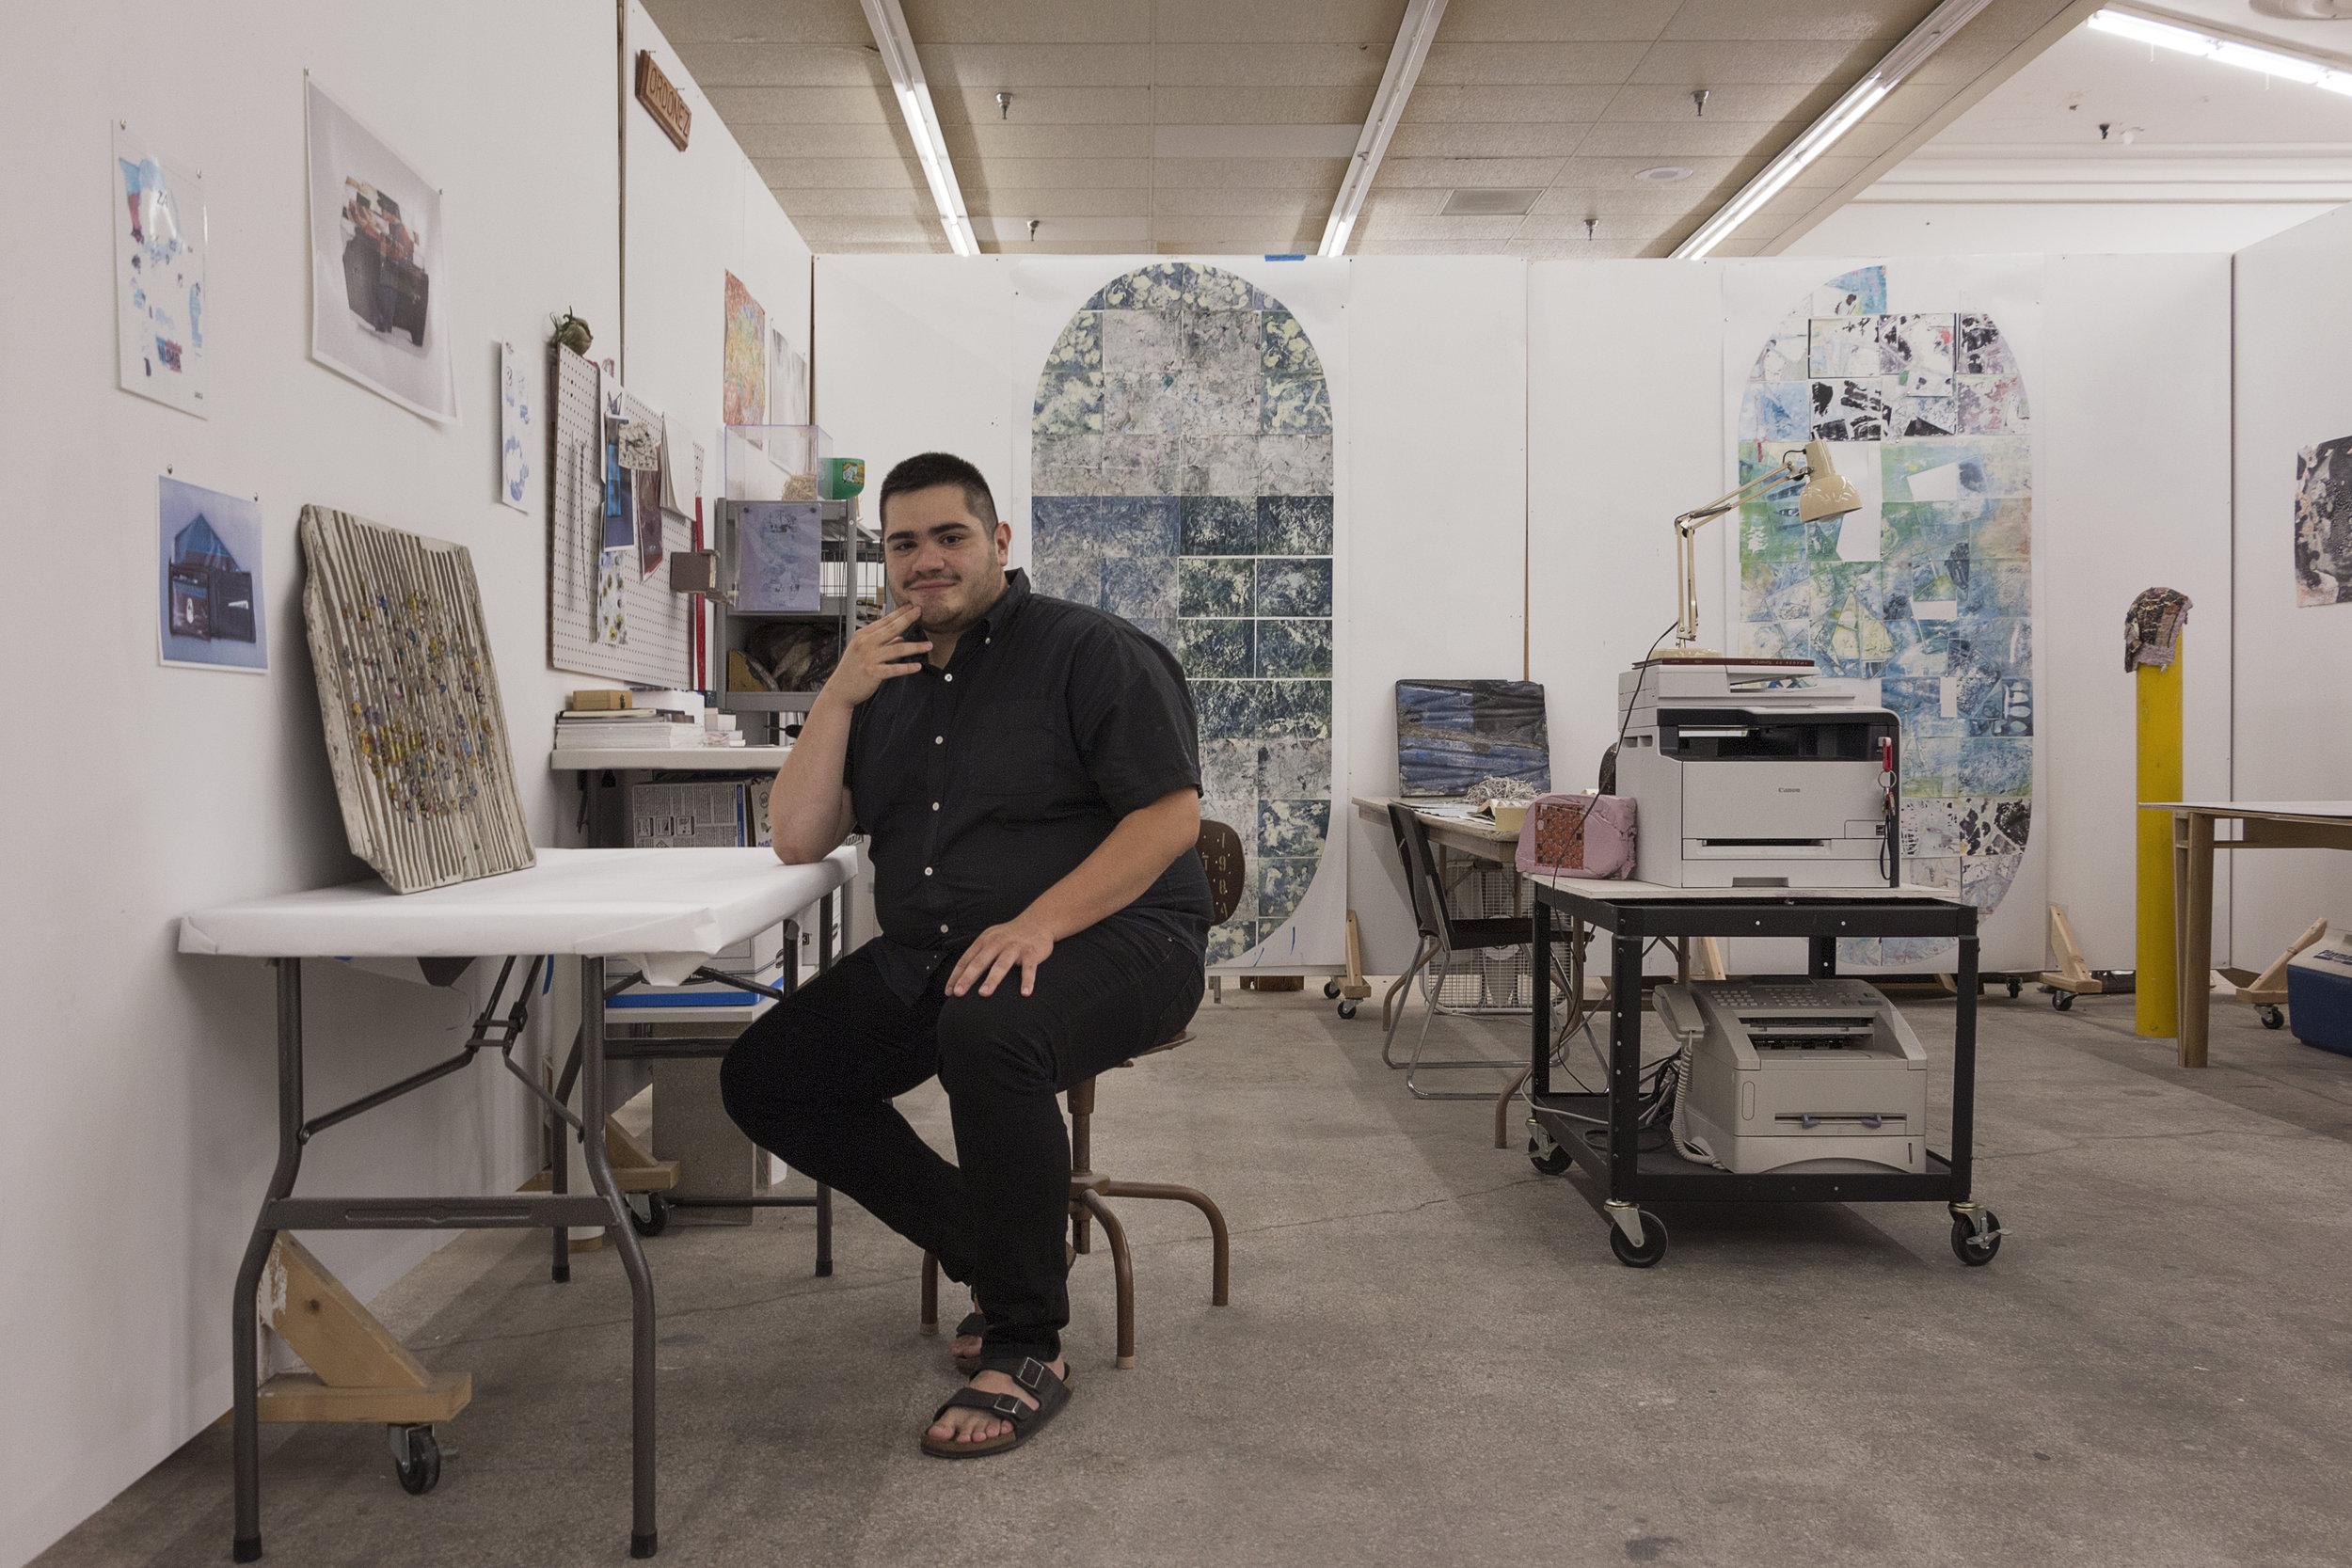 interview: Andrew Ordonez — fields